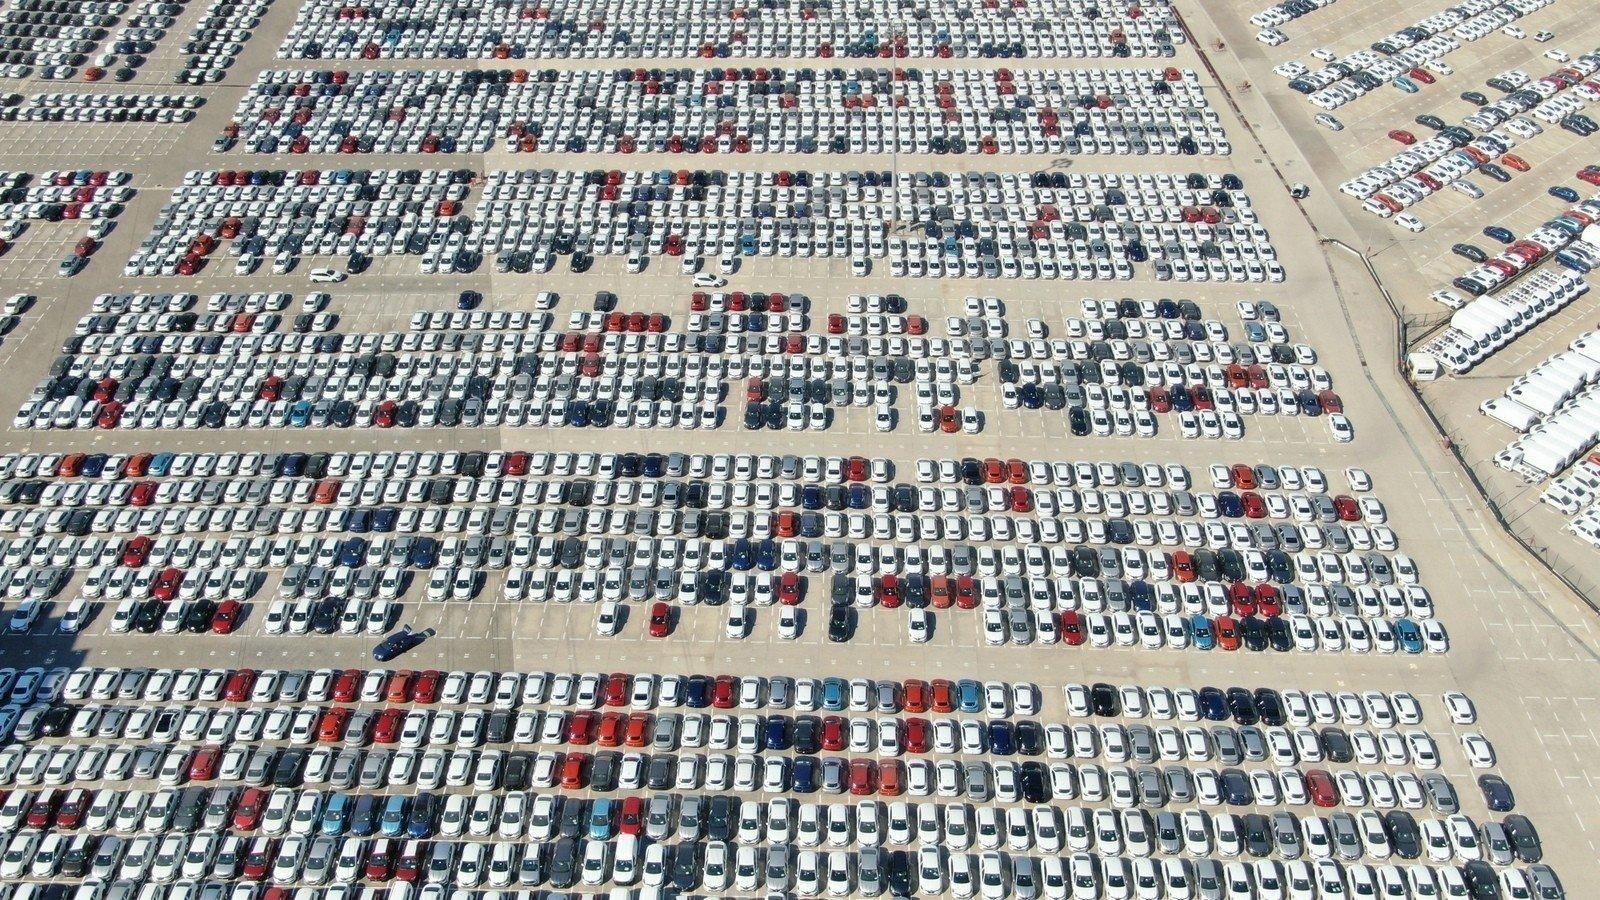 Carss parked at a plant in northwestern Bursa province, Turkey, Oct. 3, 2020. (IHA Photo)